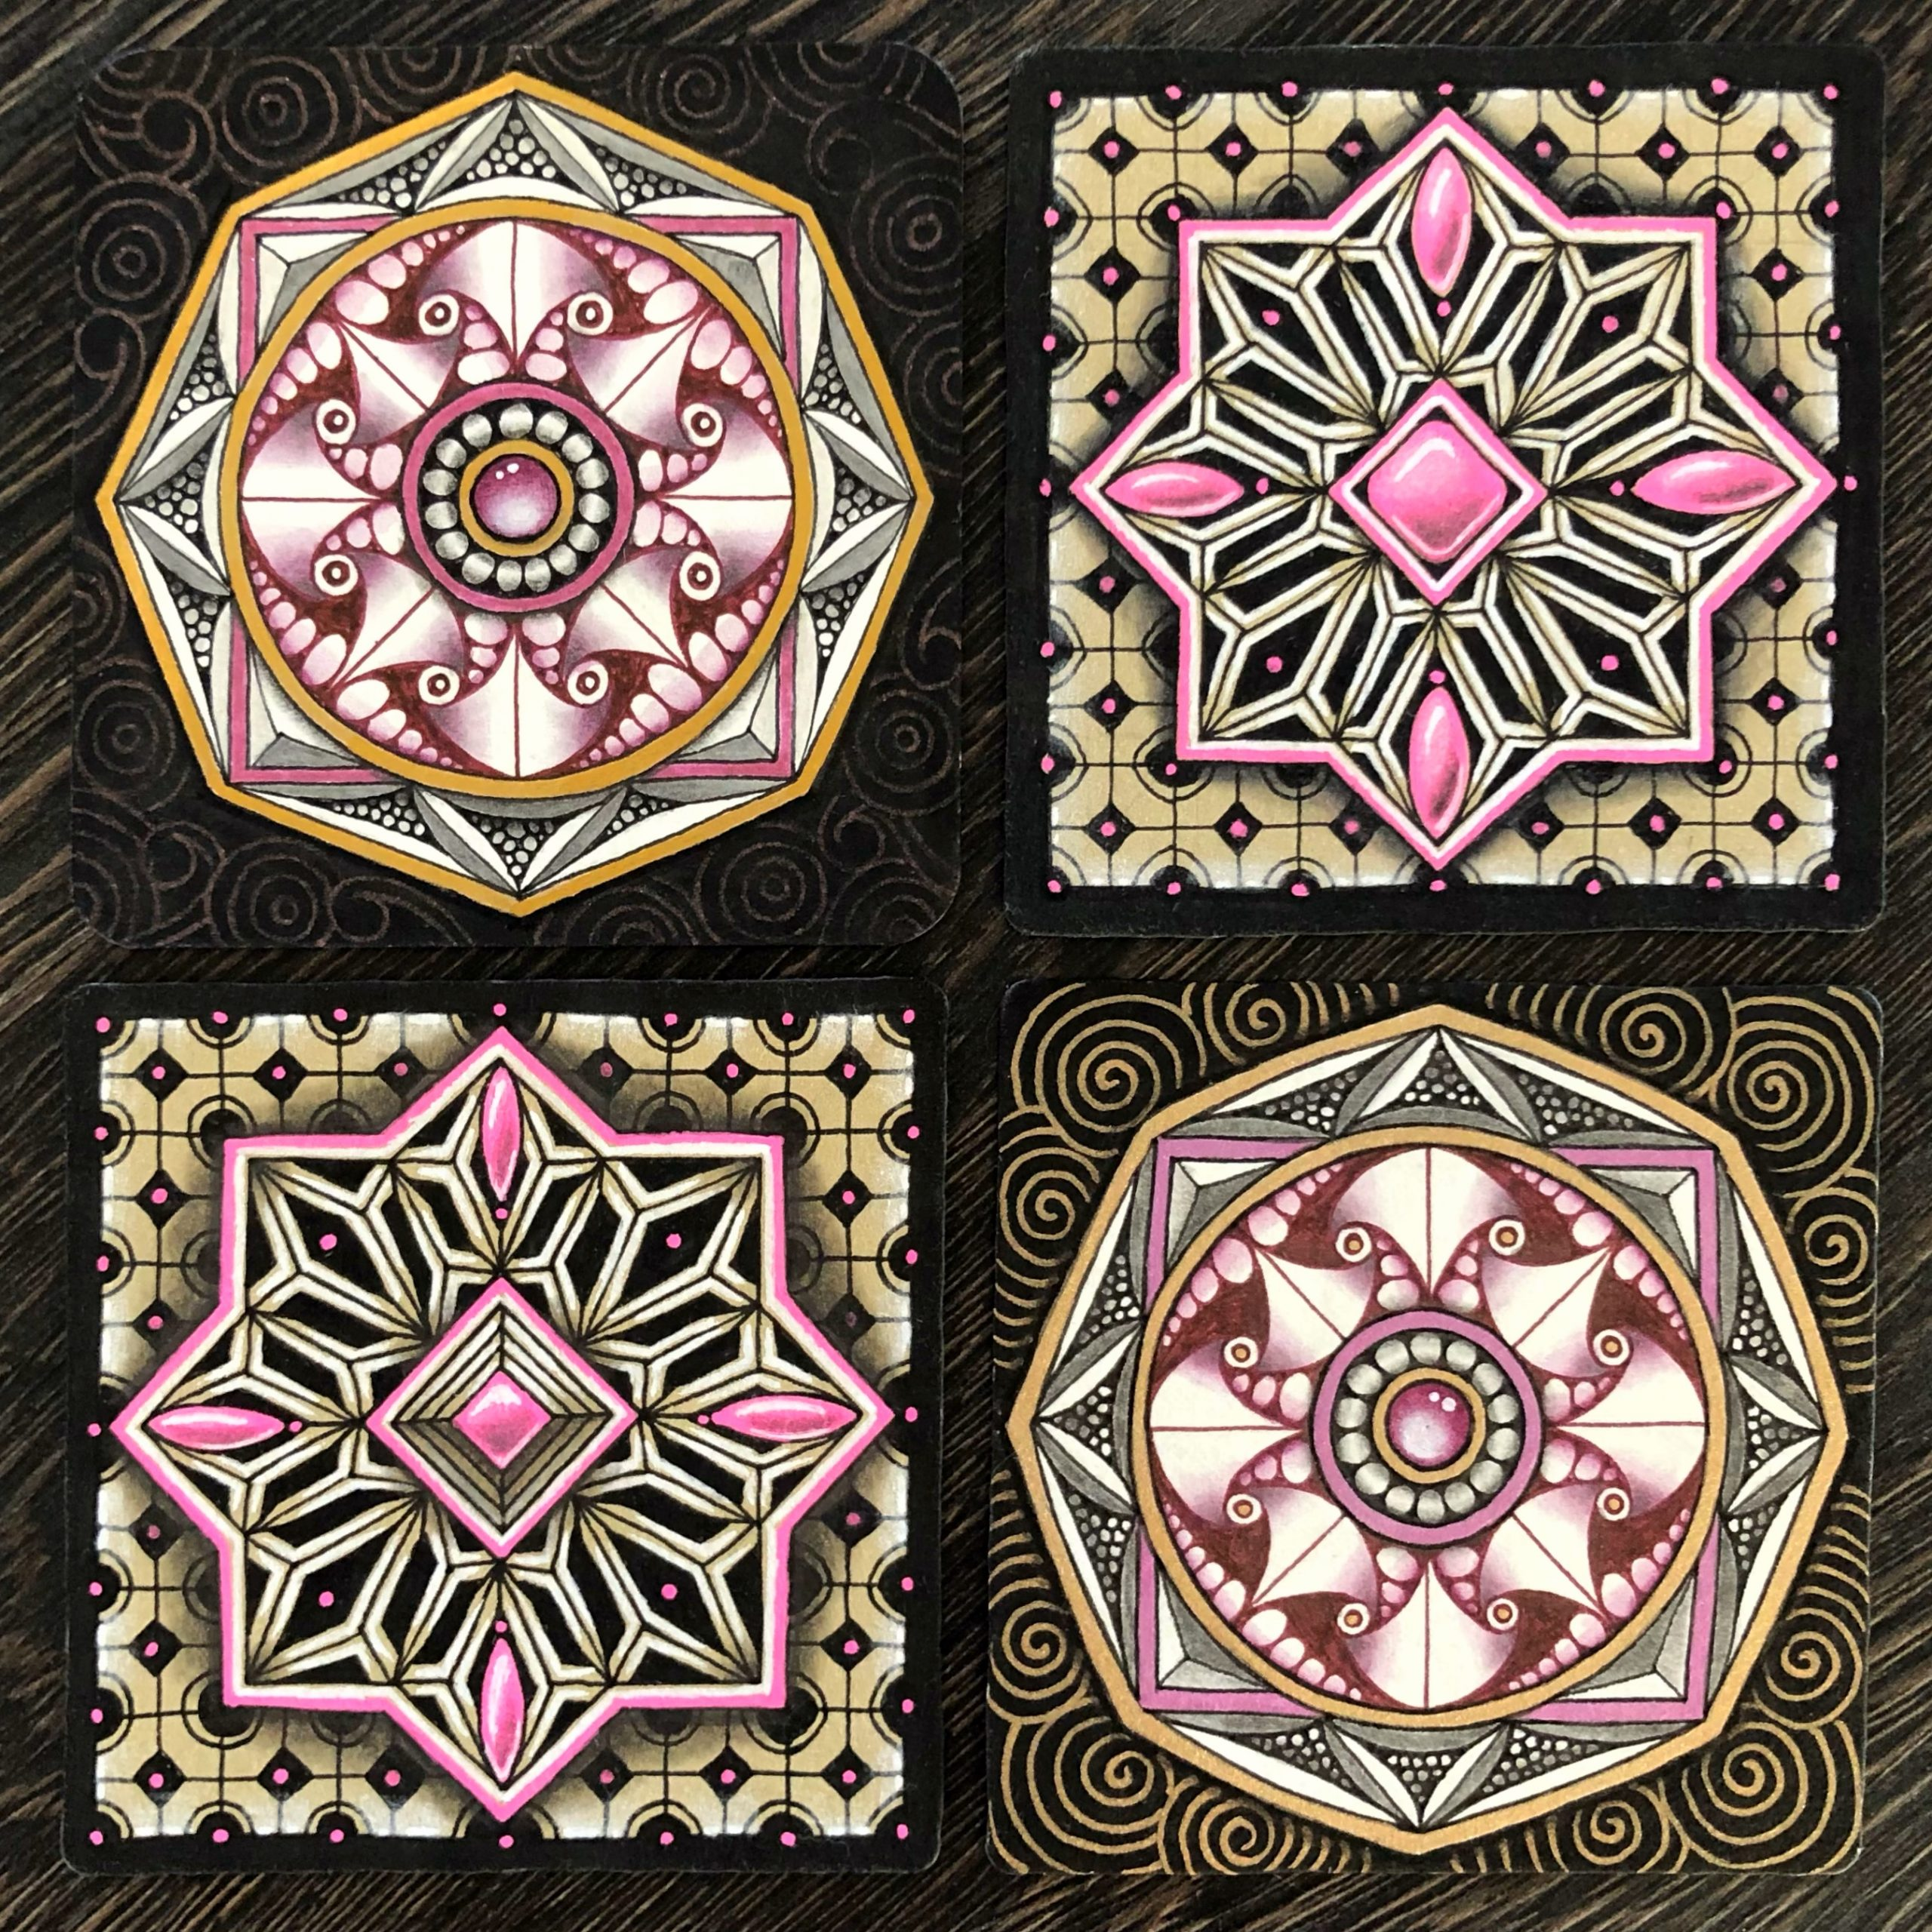 Zentangle Reticula and Fragments Mandalas